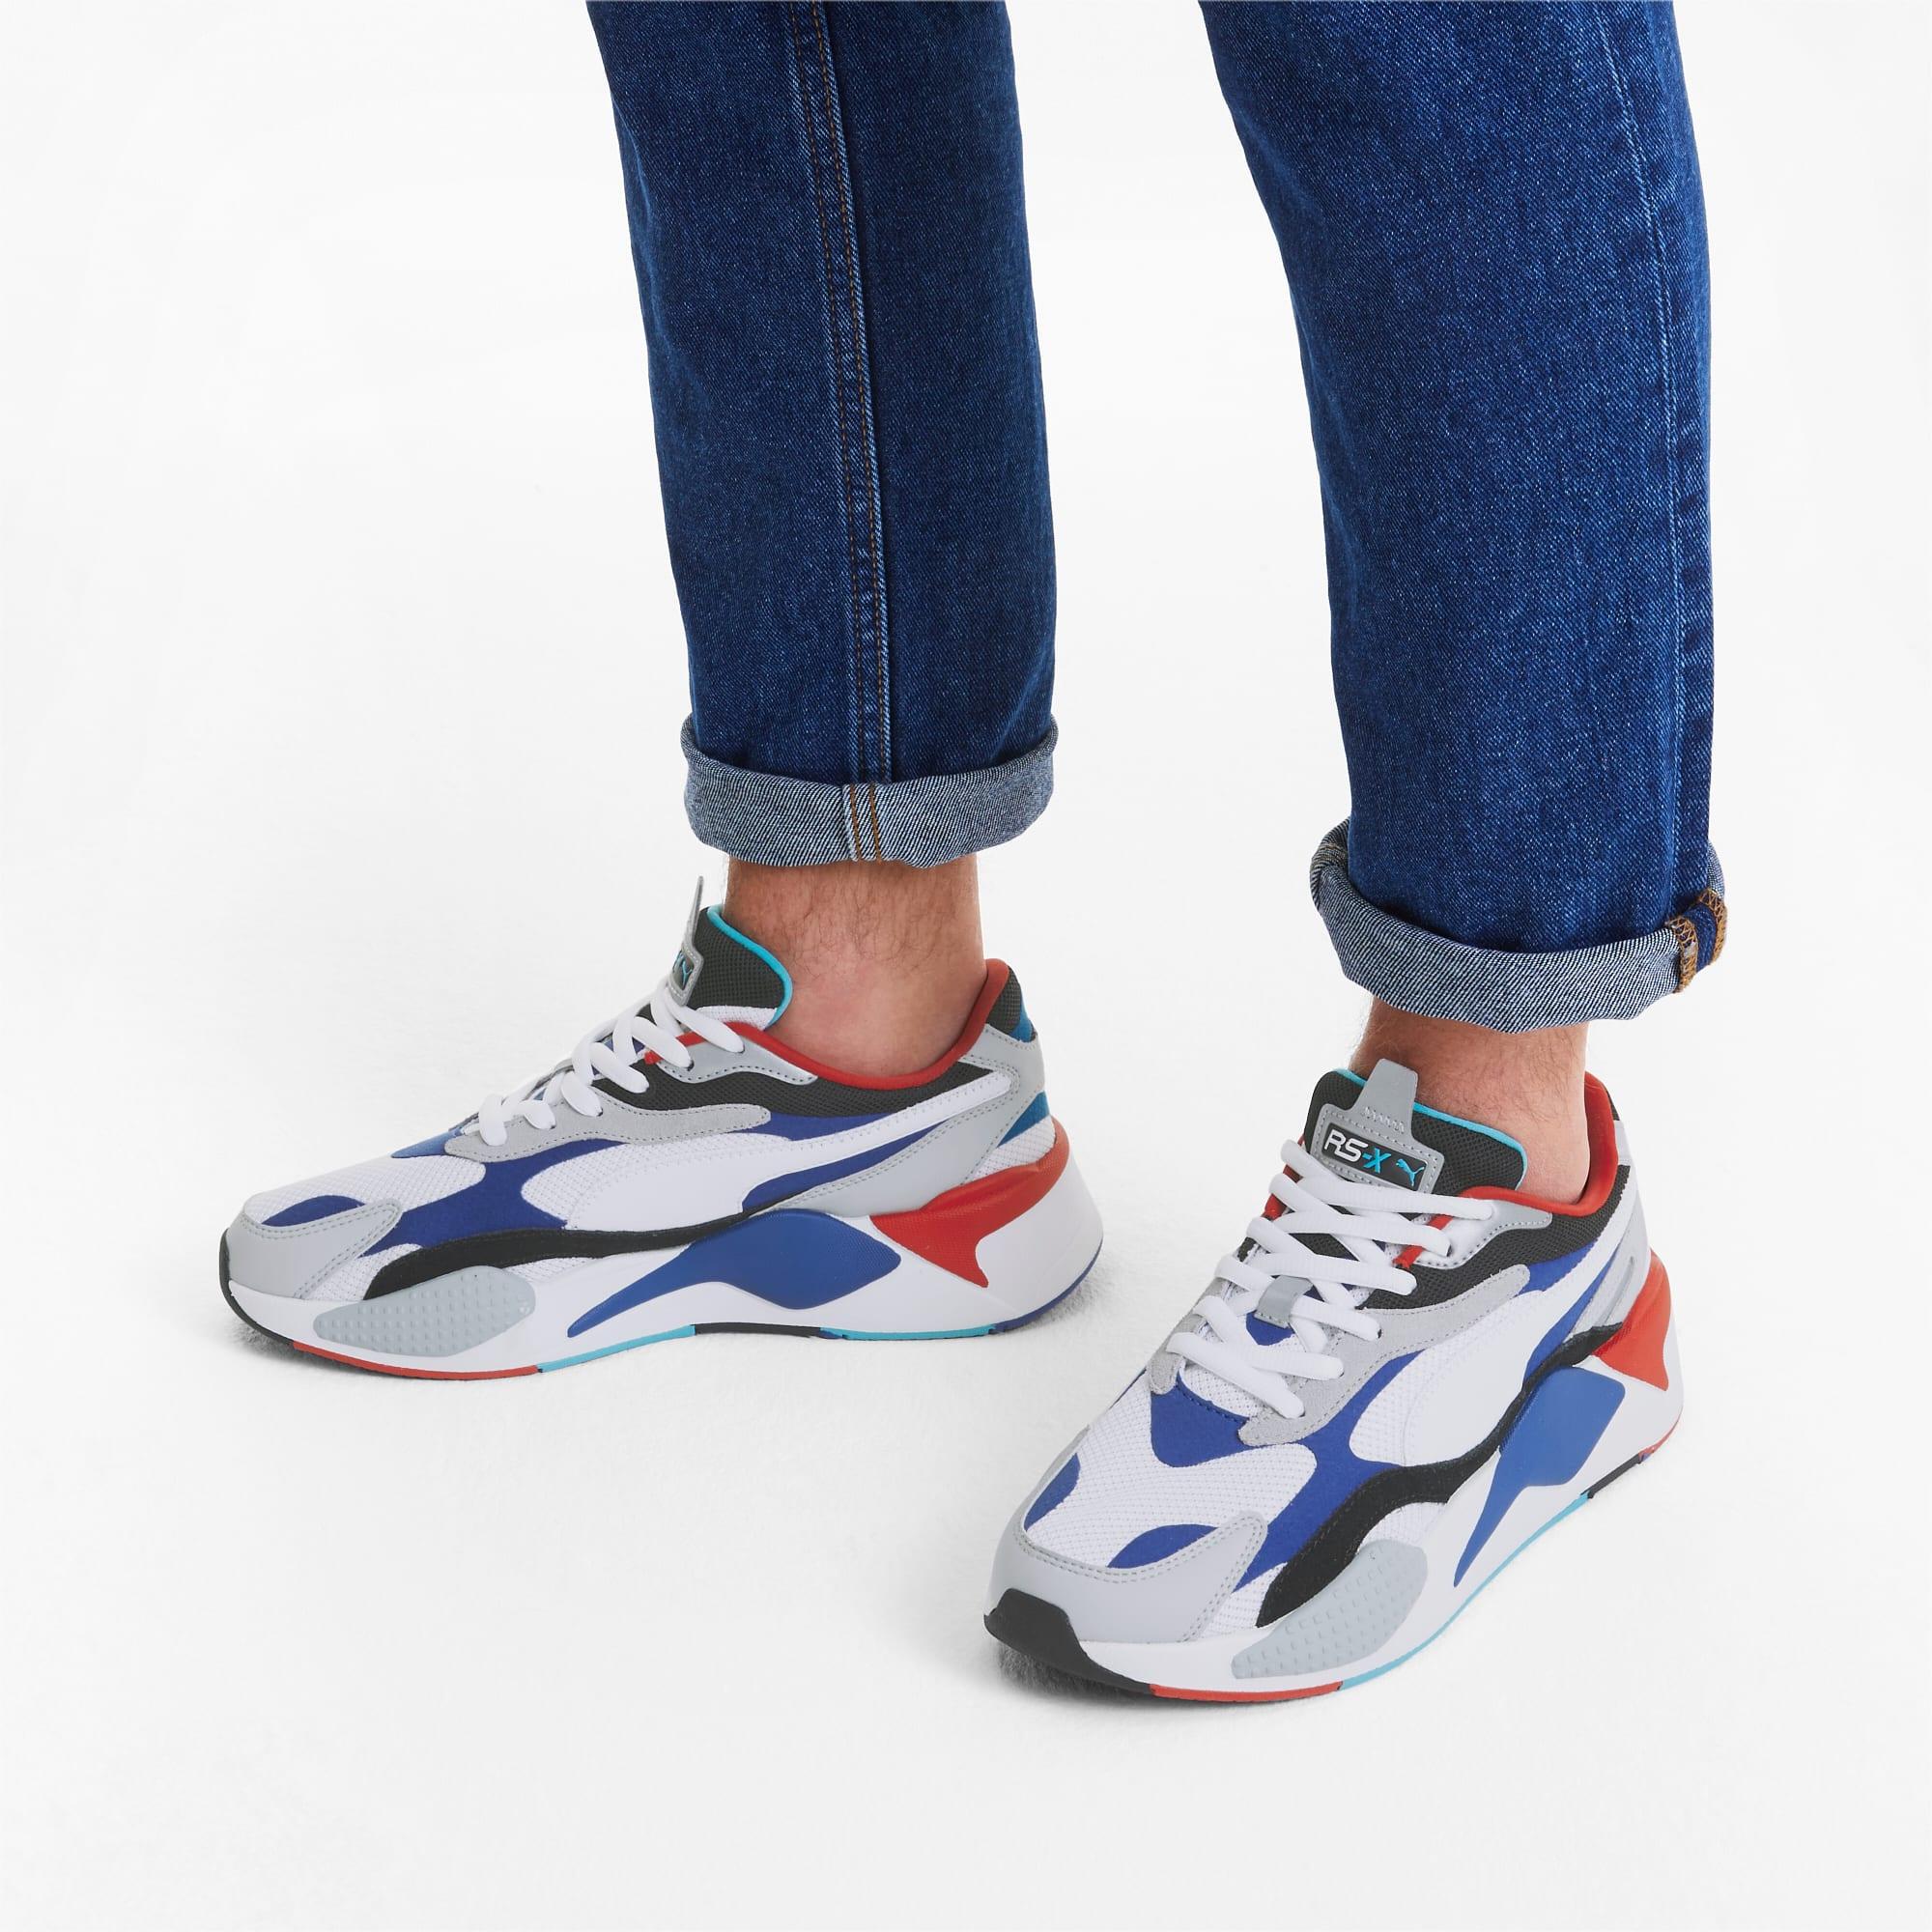 RS X³ Puzzle Sneaker | PWhite Dazzling Blue Hi Rise | PUMA